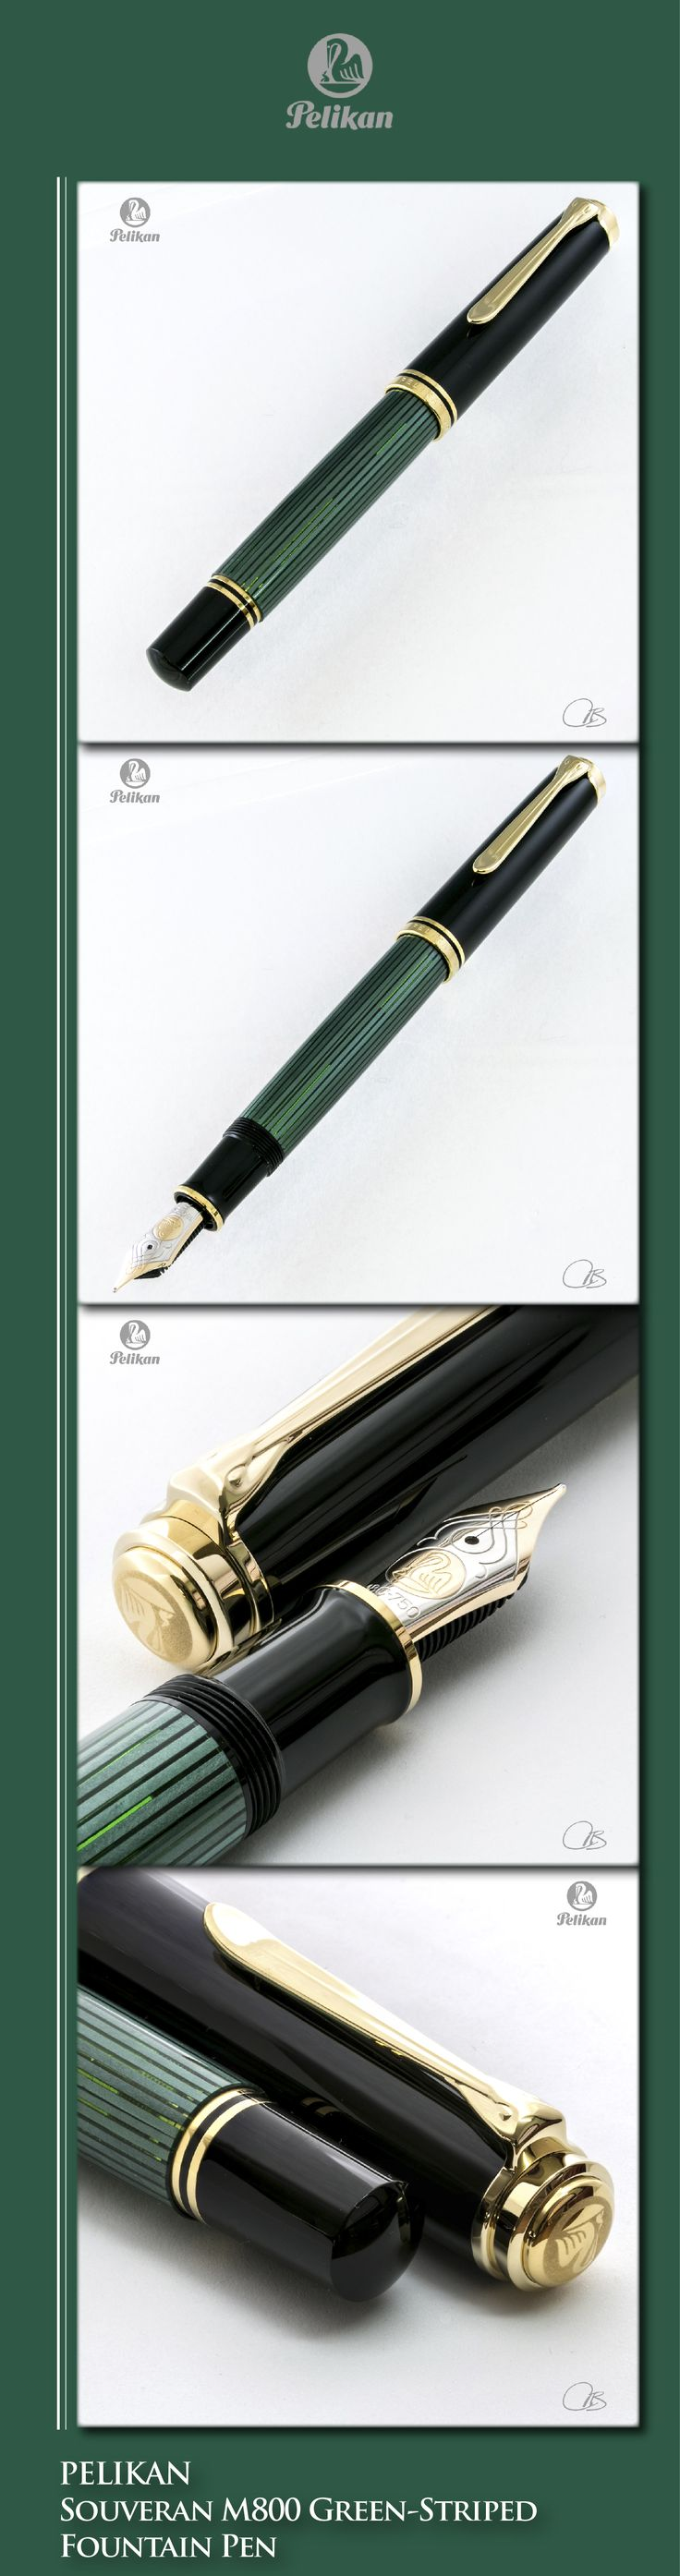 PELIKAN Souveran M800 Green-Striped Fountain Pen (acrylic & resin body, gold-plated trim, 18kt dual-tone solid gold nib) - 2016 / Germany